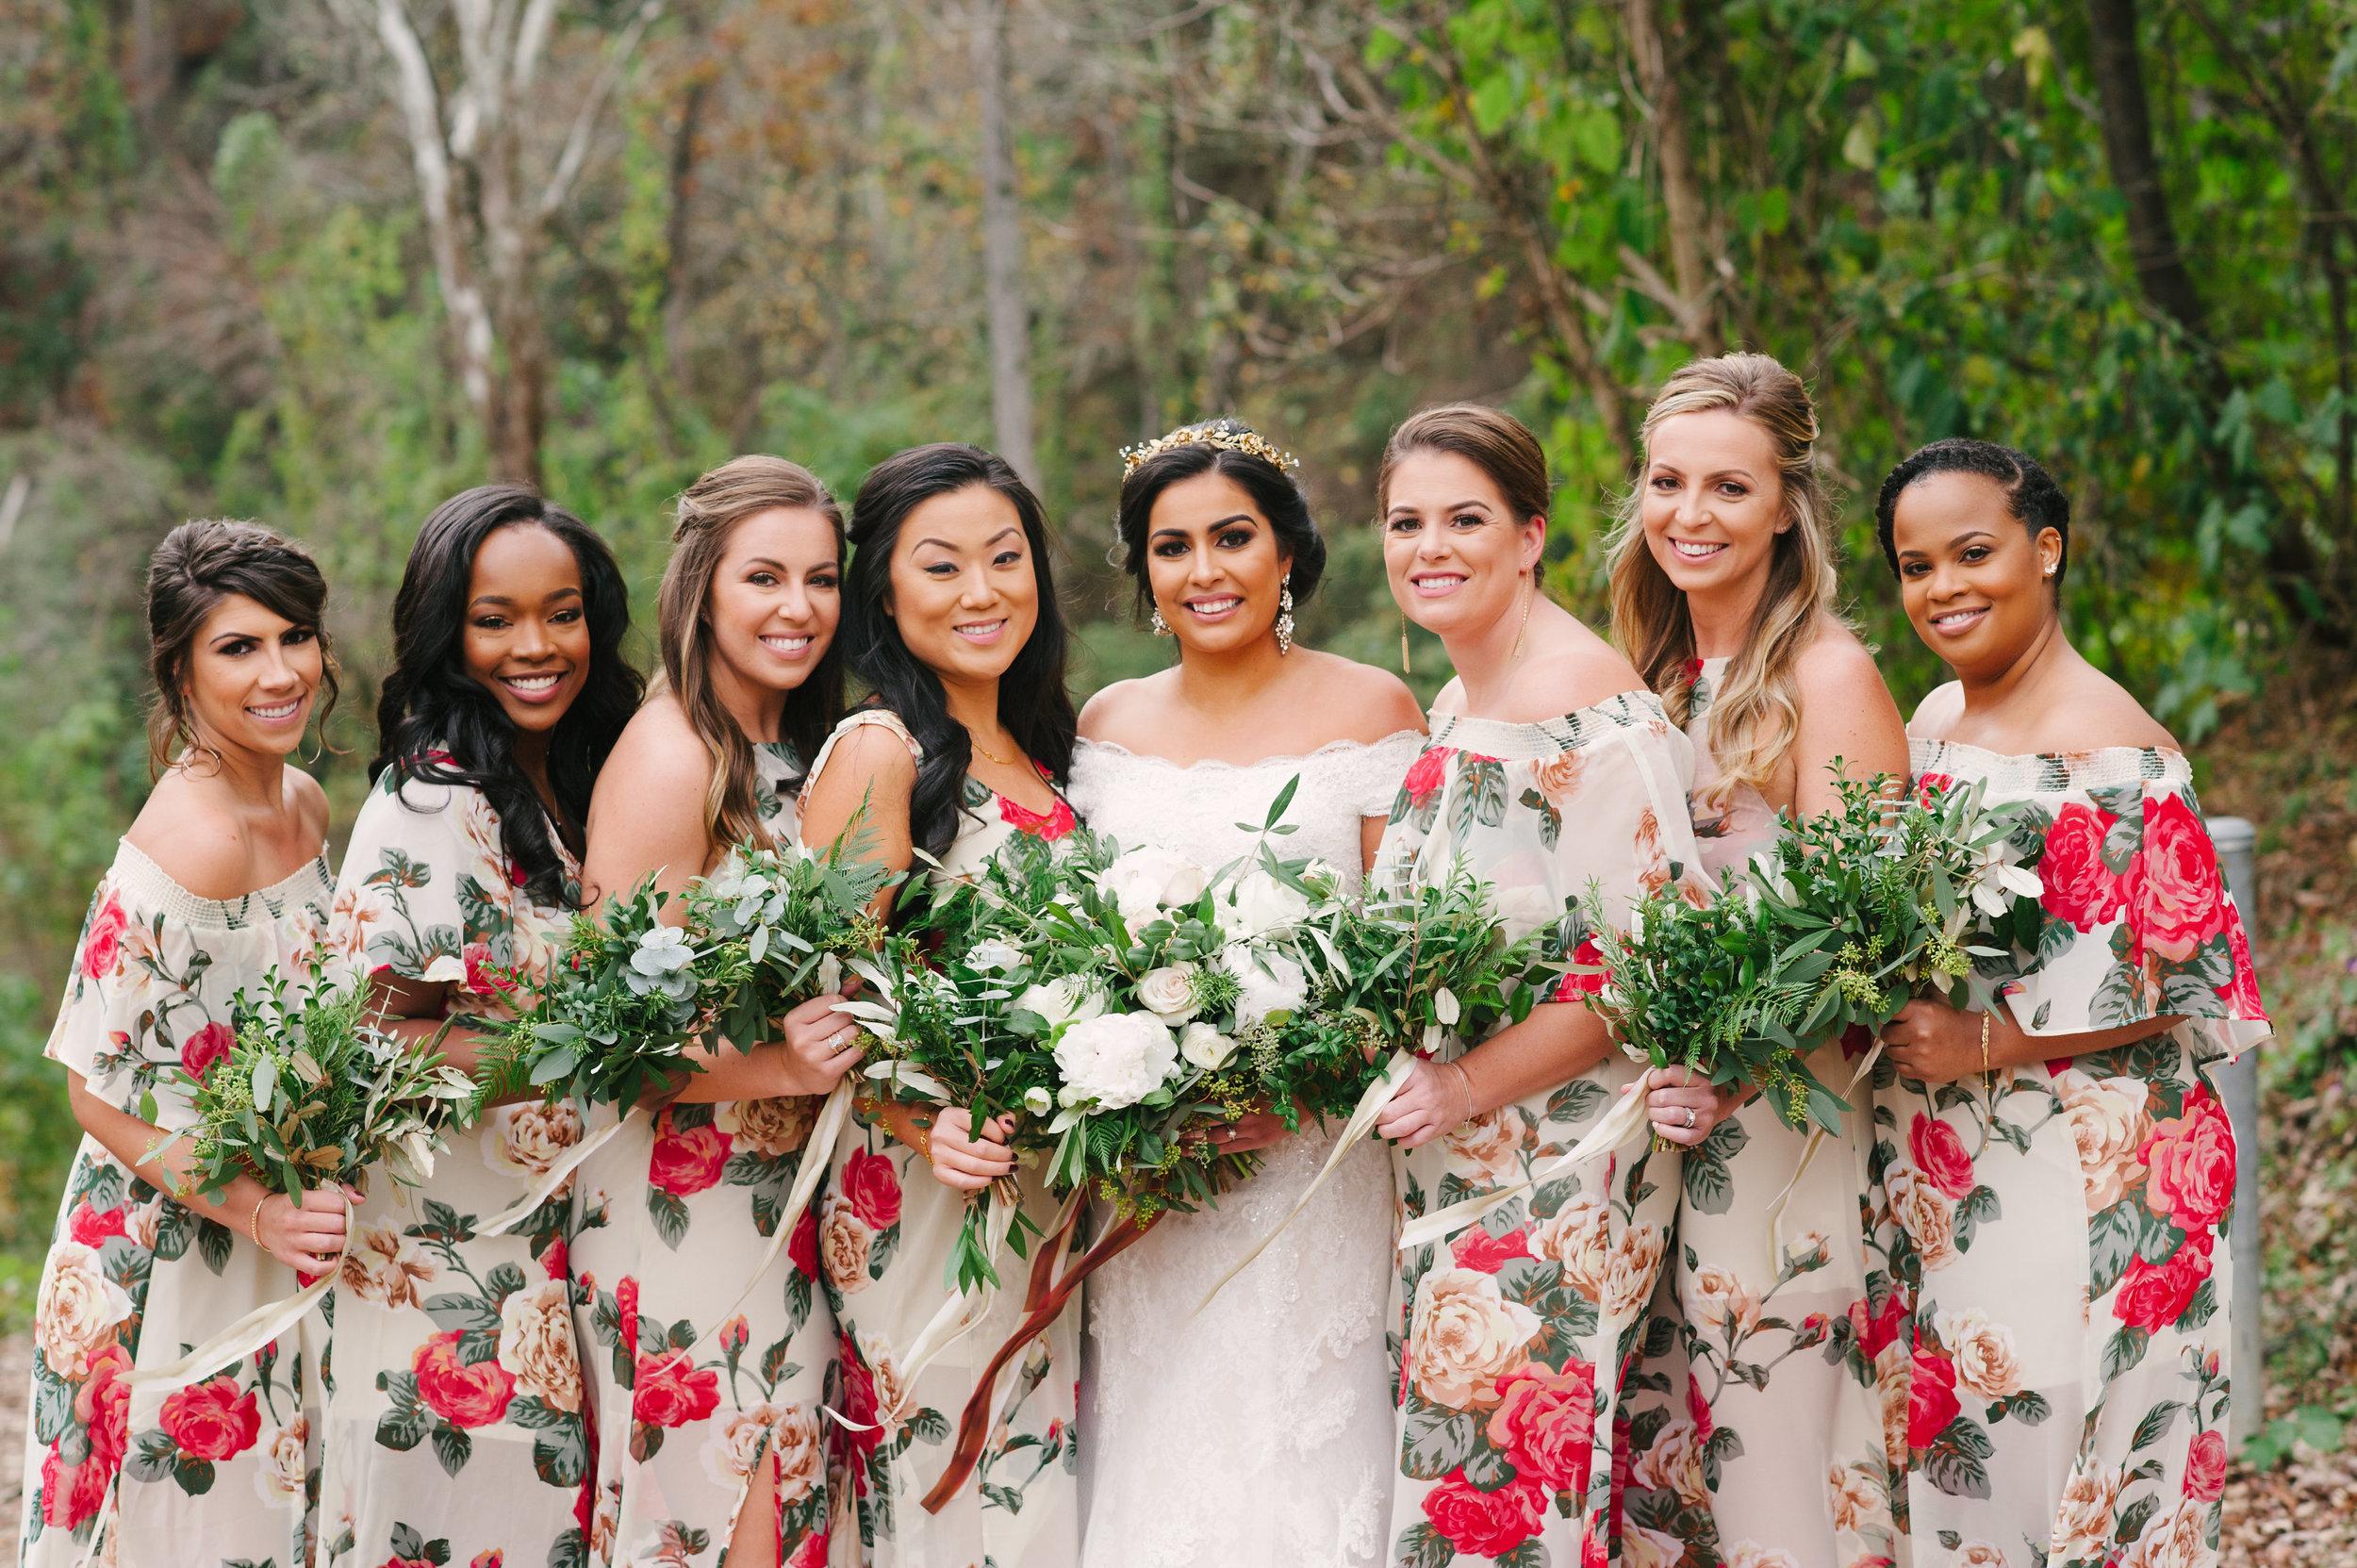 Rosalina's beautiful bridal party! Hair by Renee Locher Makeup and Hair.